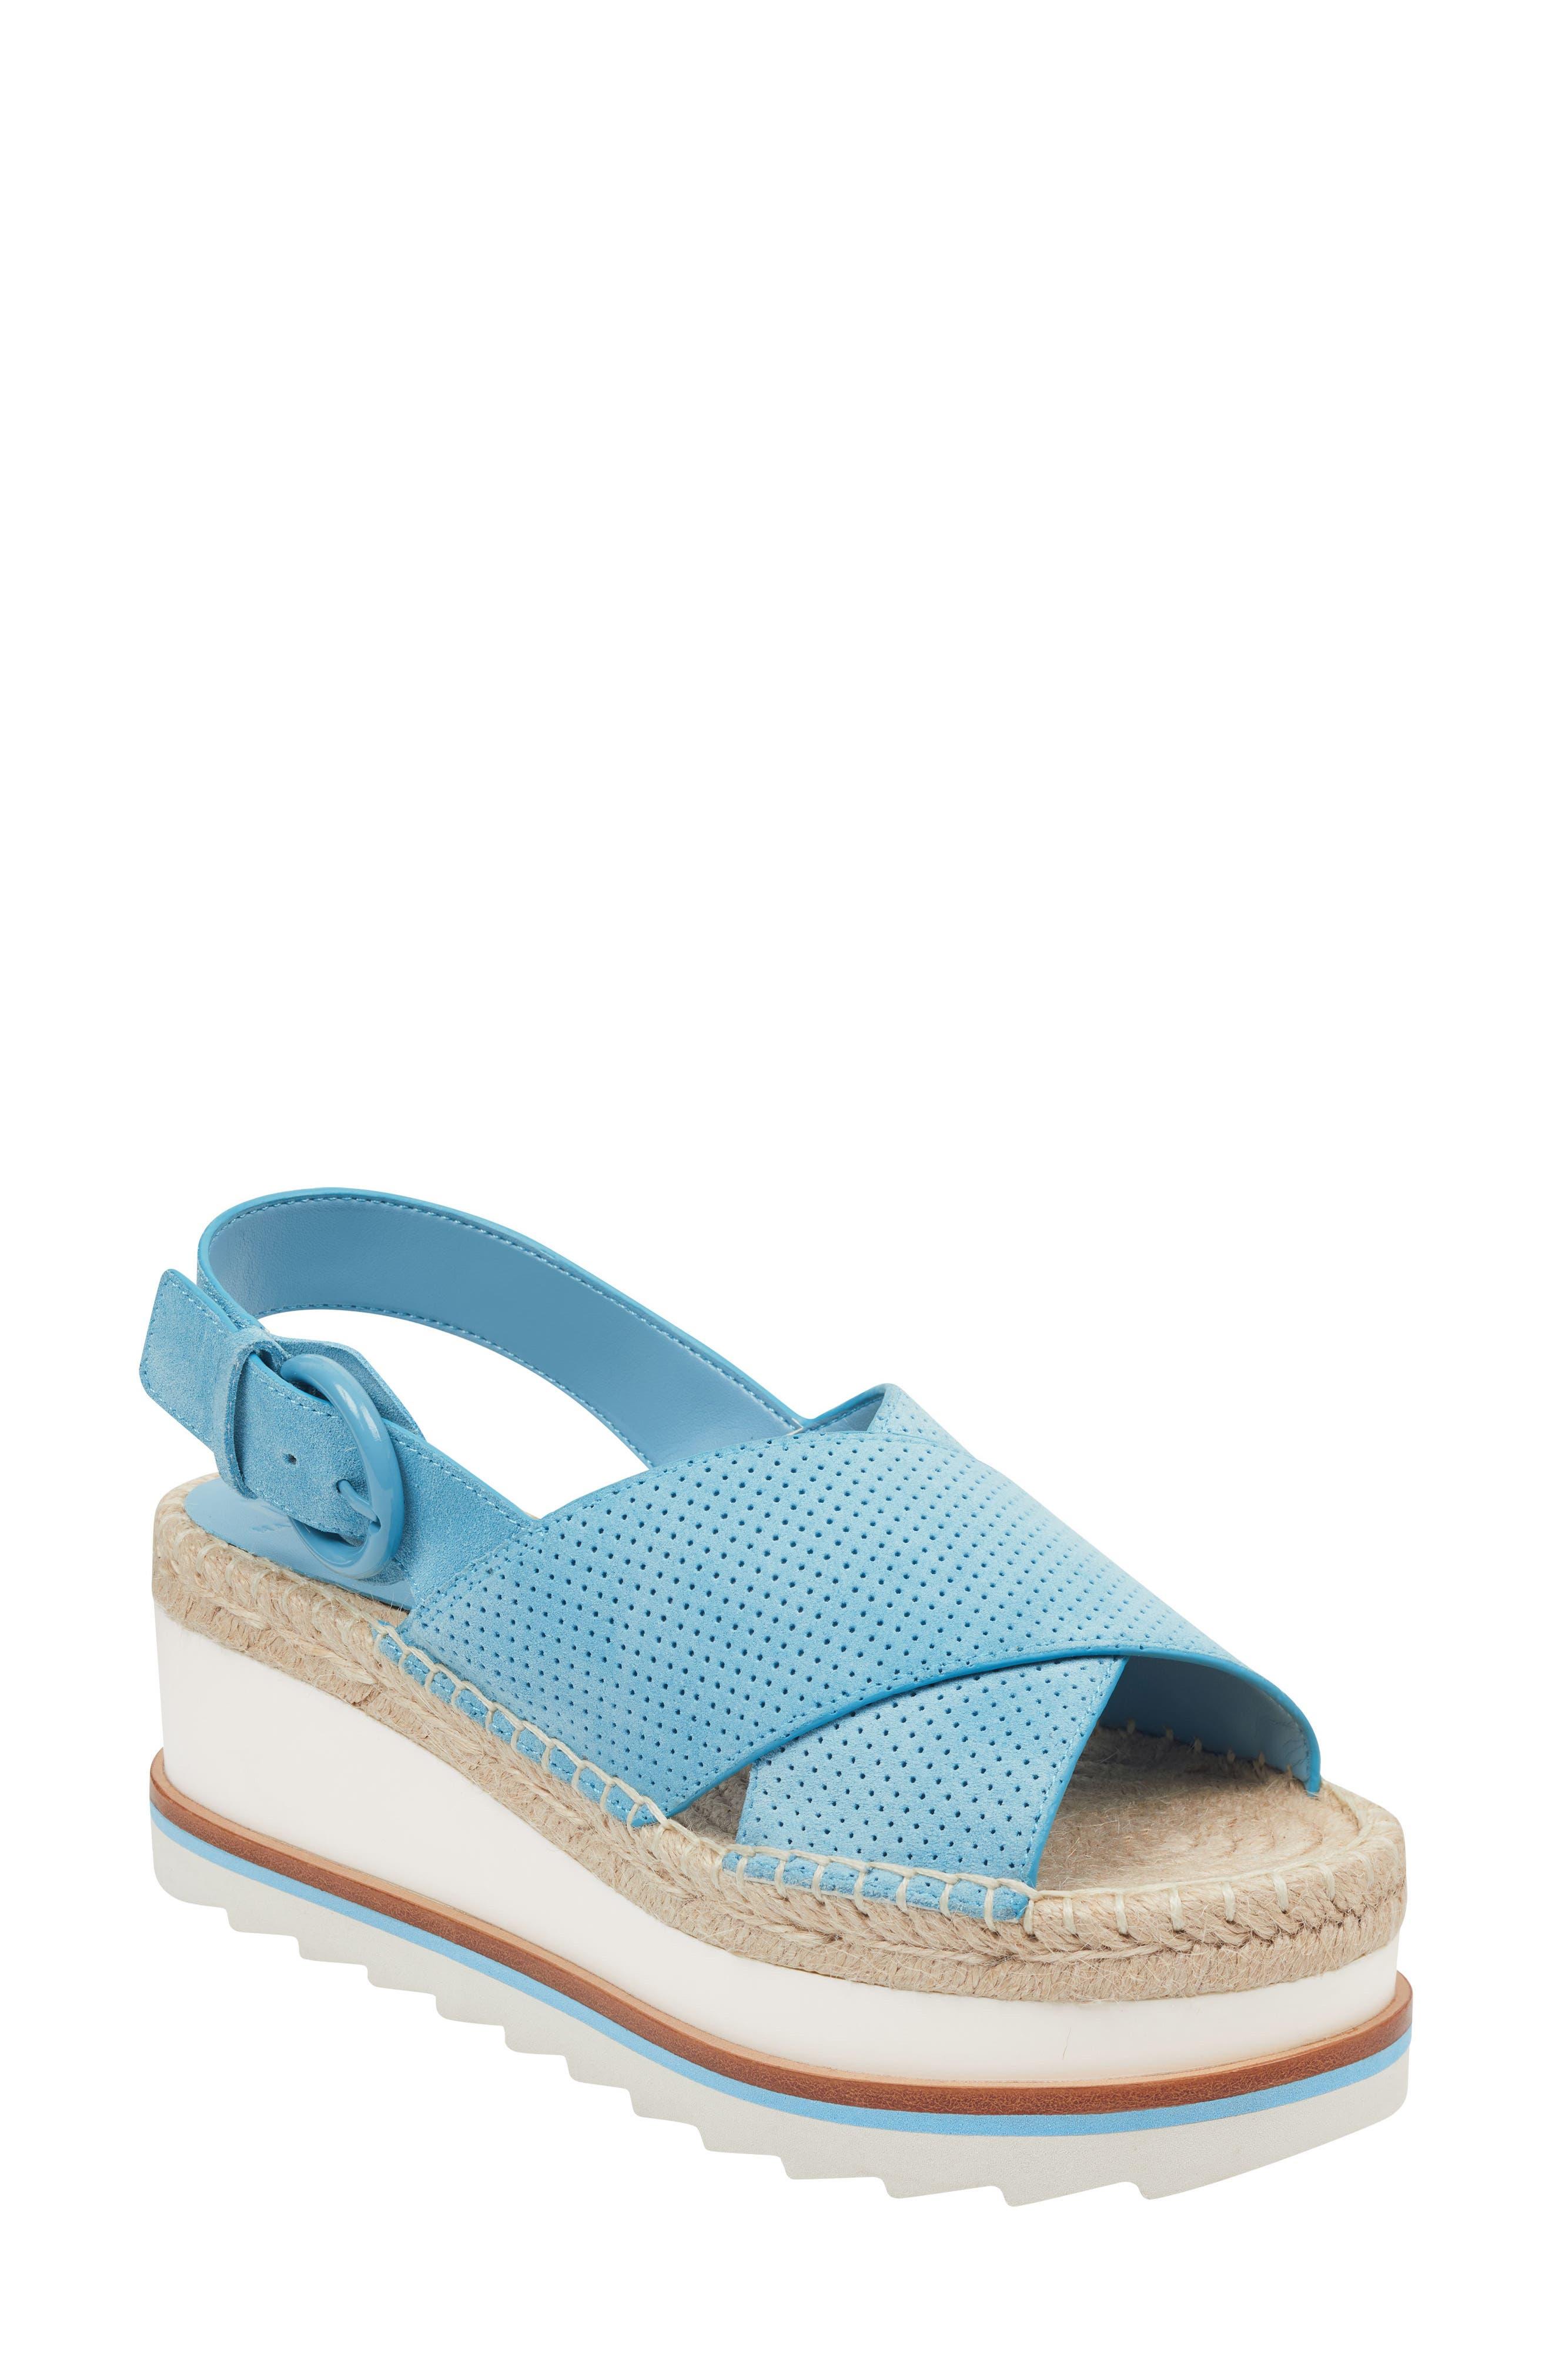 Marc Fisher Ltd Gellyn Slingback Sandal, Blue